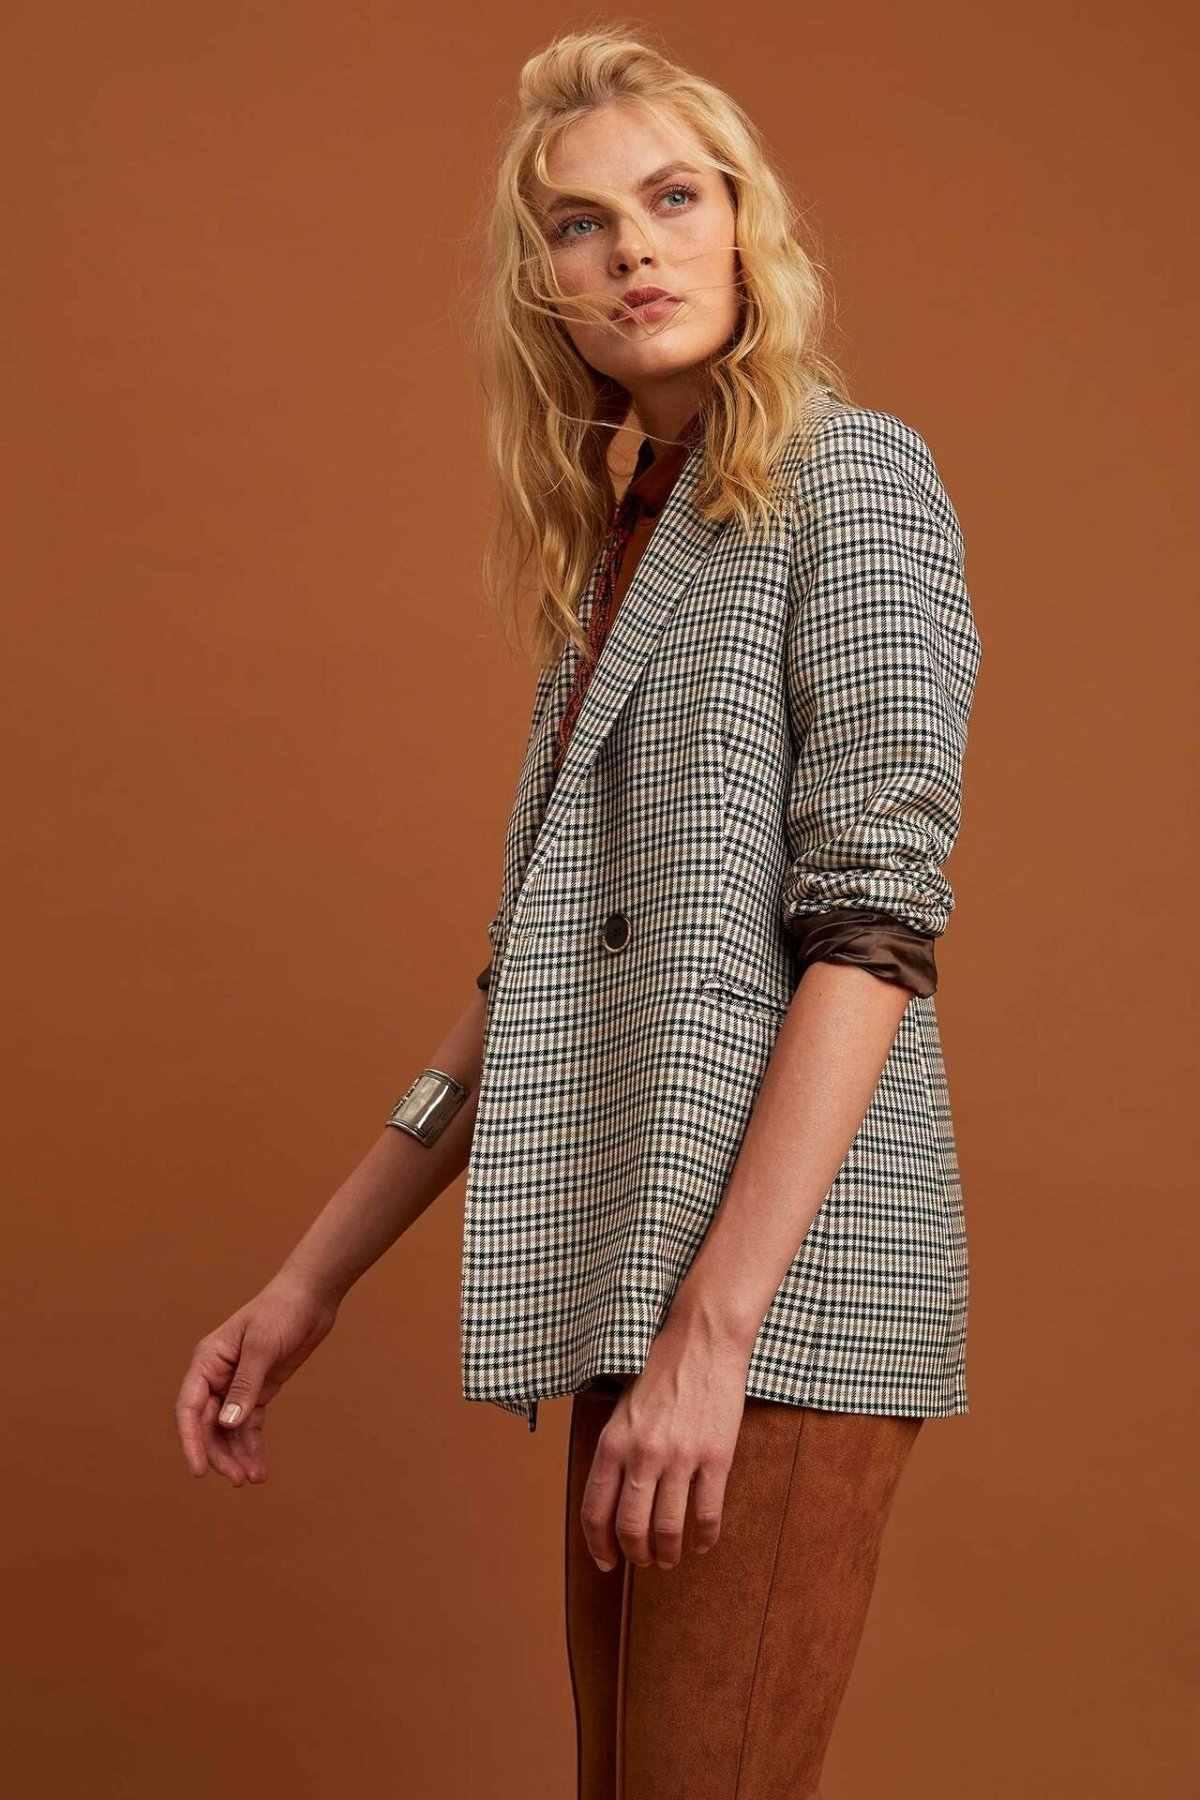 DeFacto Mode Frau Revers Formale Jacken Einfache Plaid Büro Anzüge Frauen Casual Hohe Qualität Mäntel Damen-M6276AZ19WN